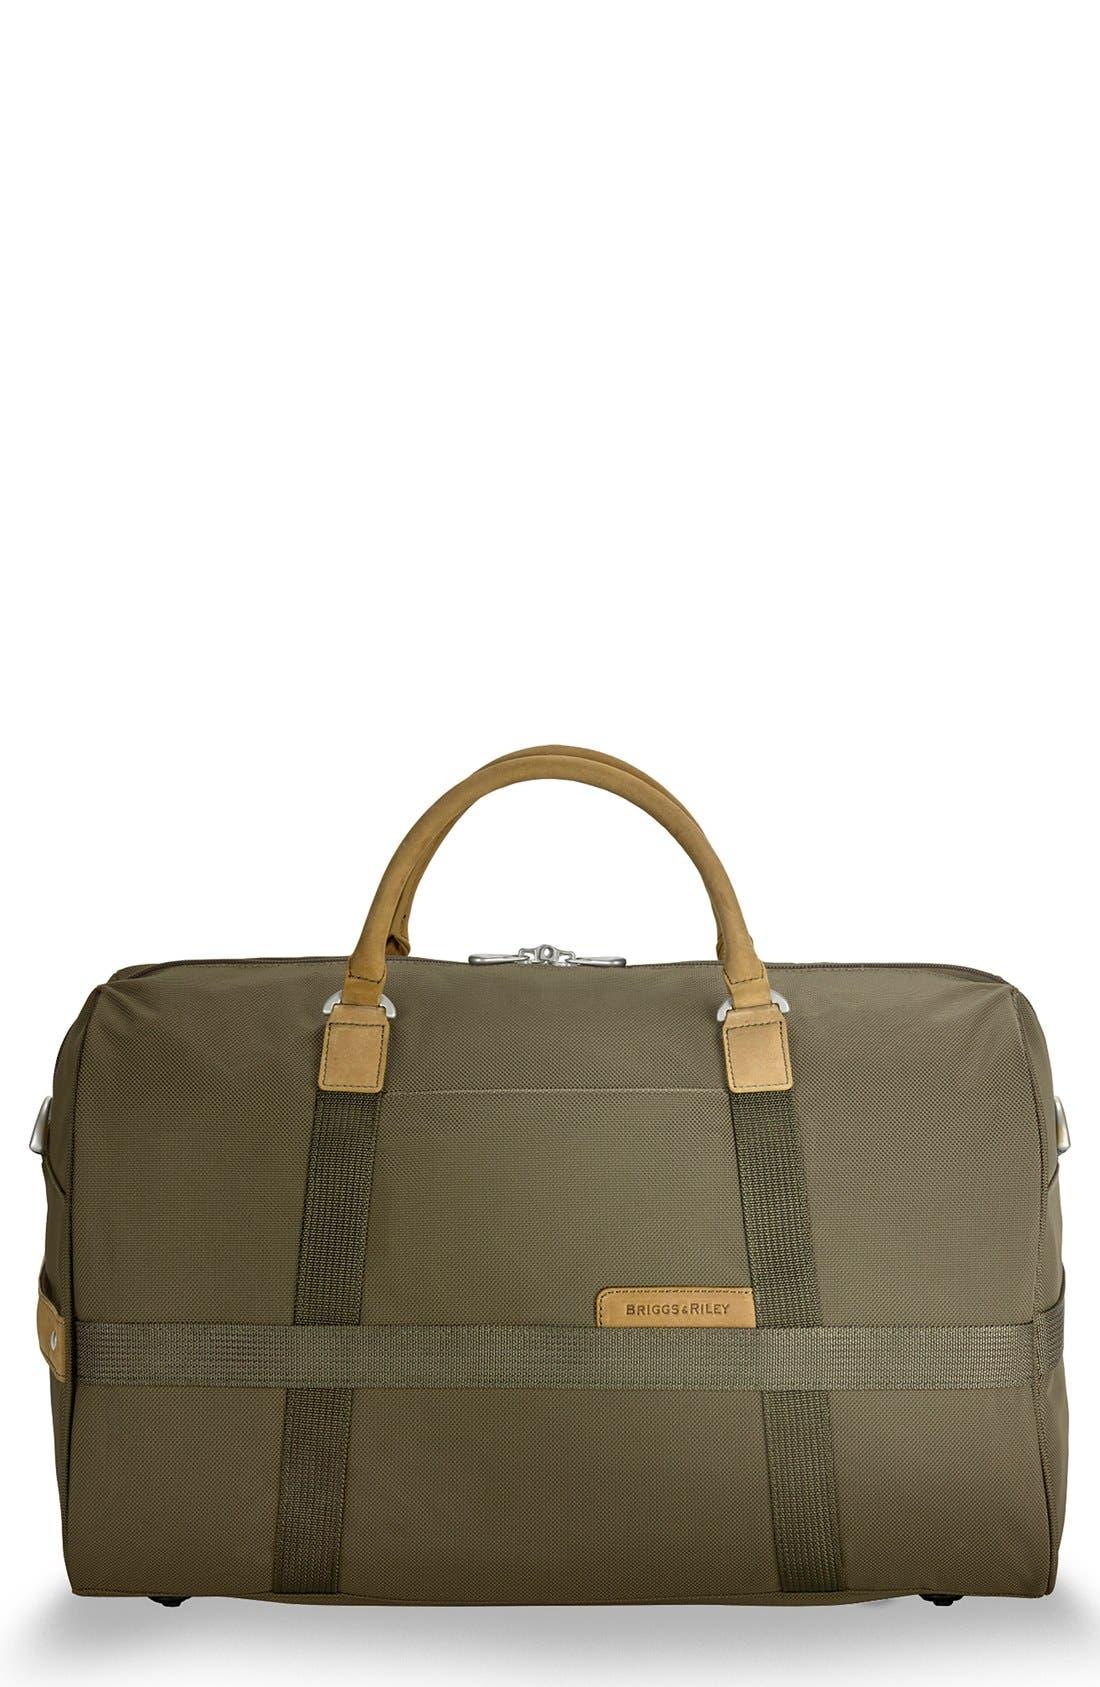 'Baseline - Medium' Duffel Bag,                             Main thumbnail 1, color,                             310